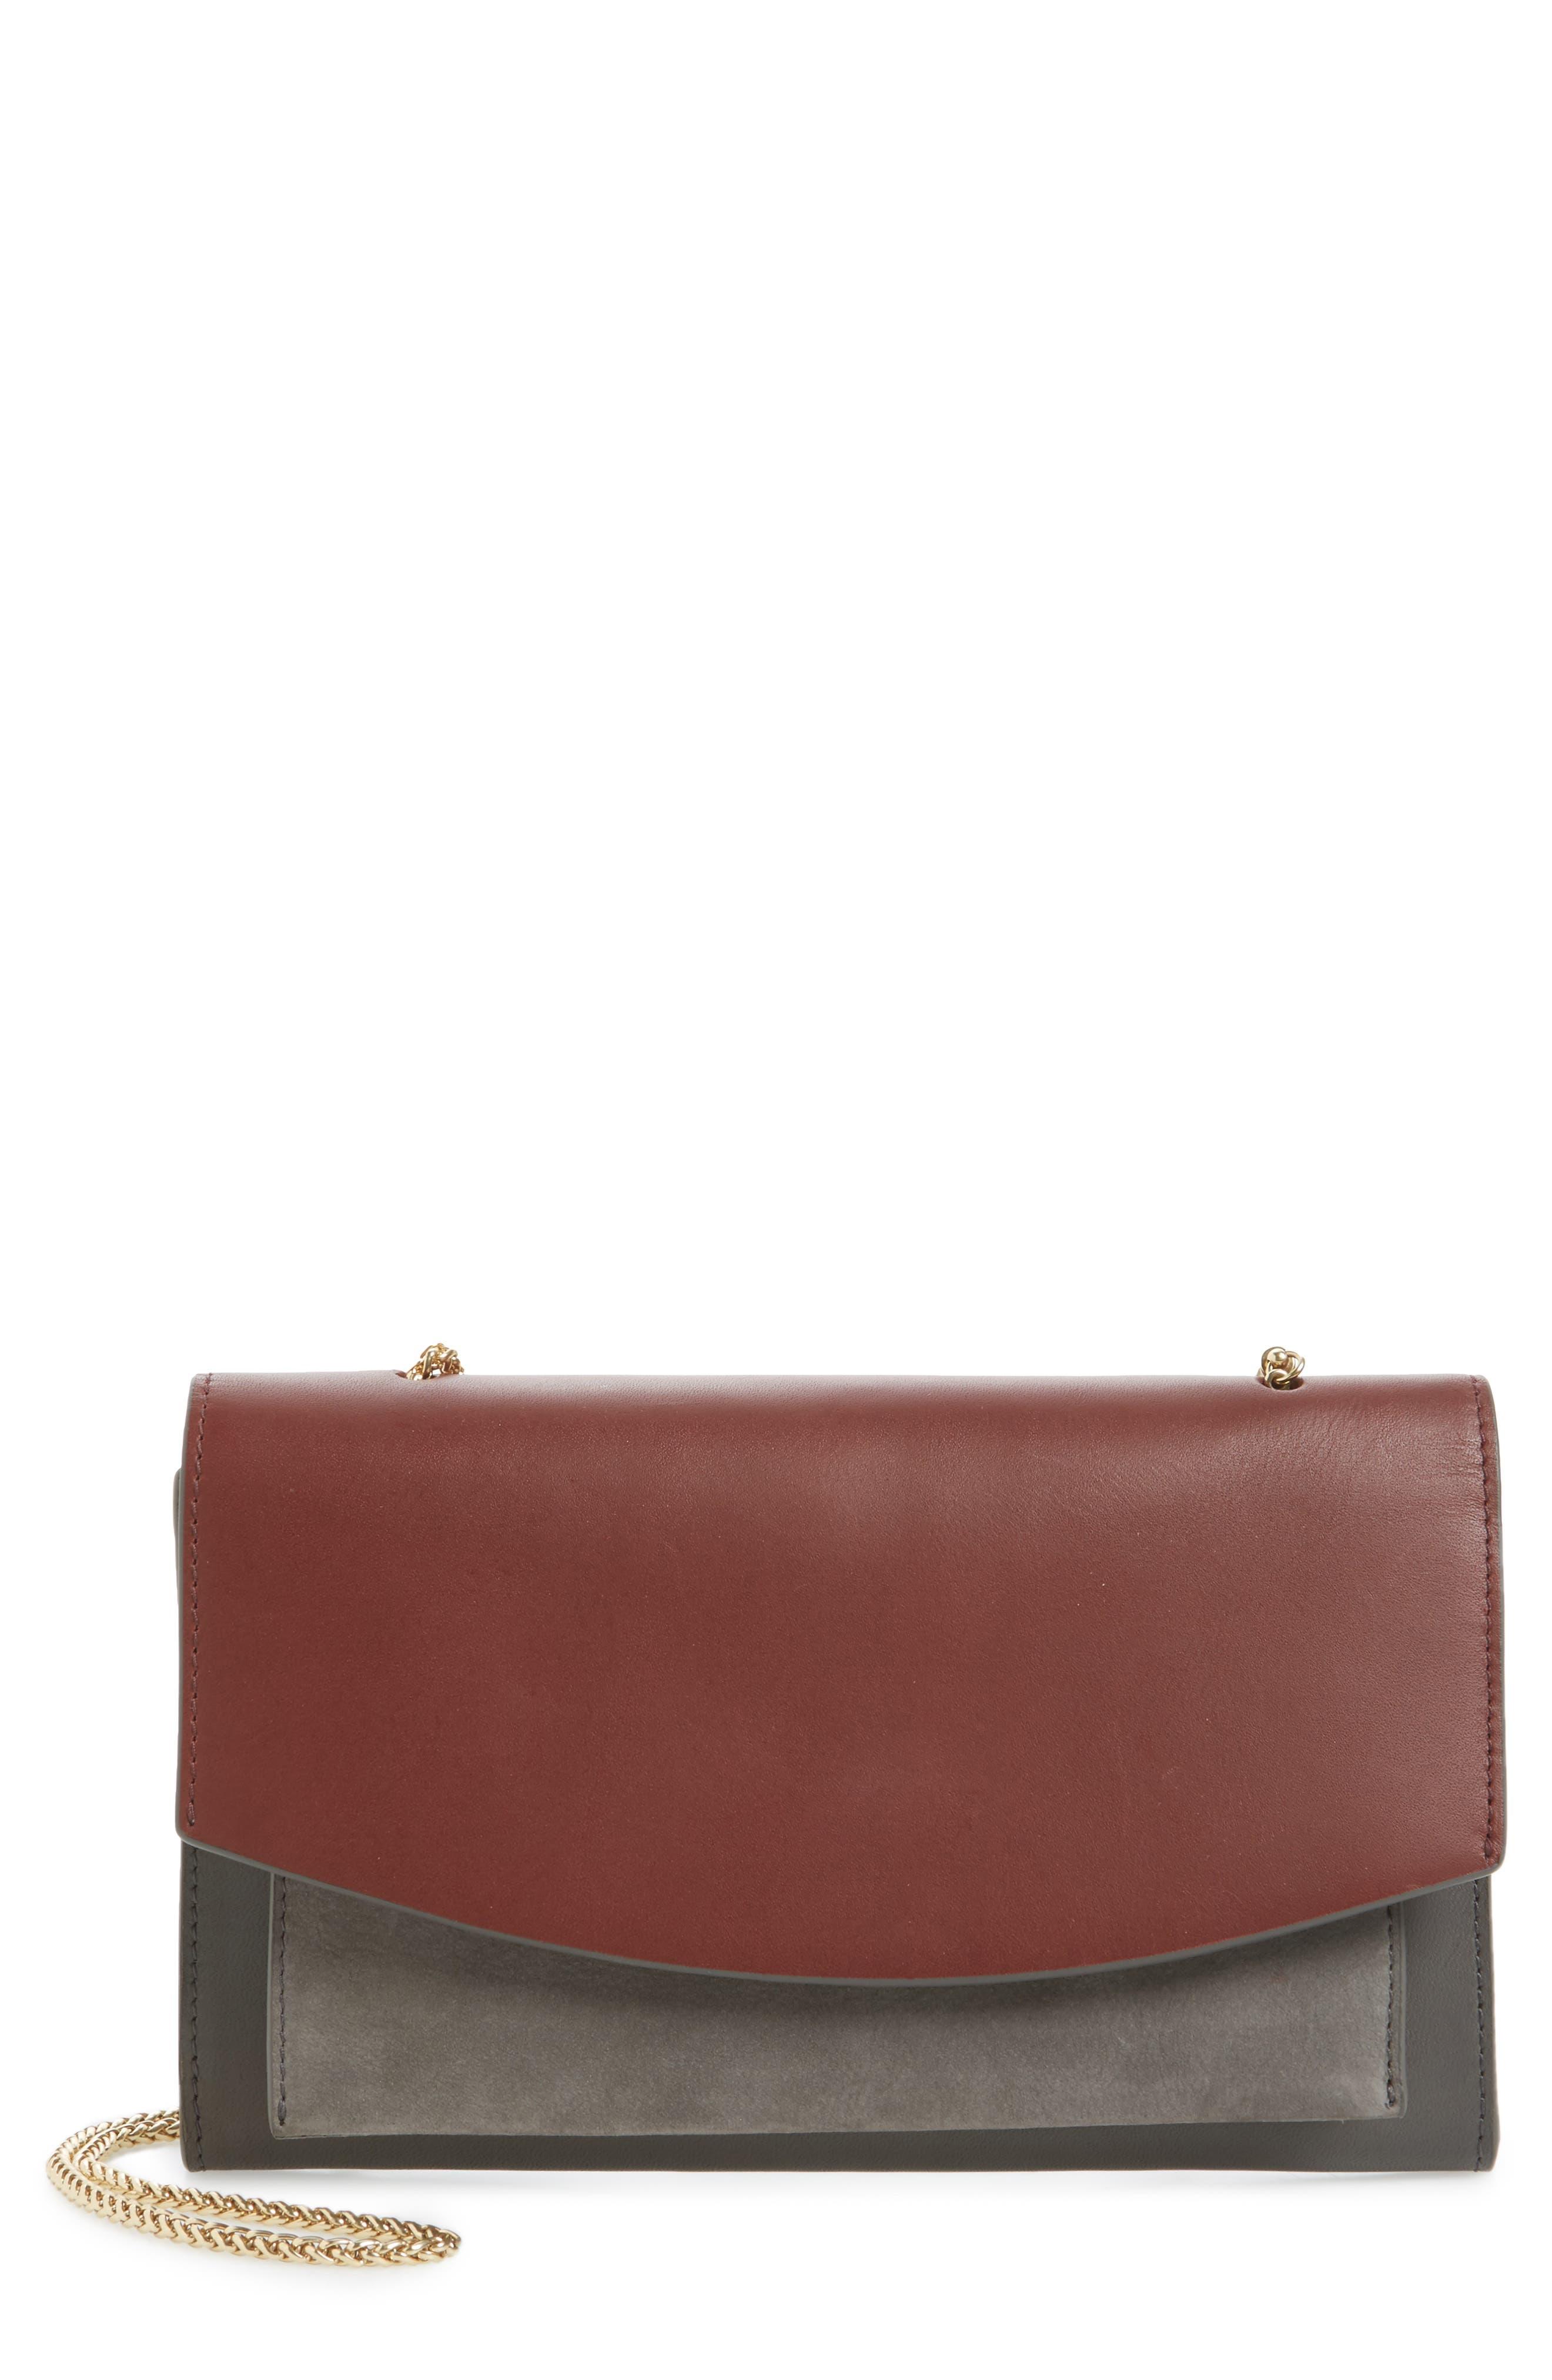 SKAGEN Eryka Leather Envelope Clutch with Detachable Strap